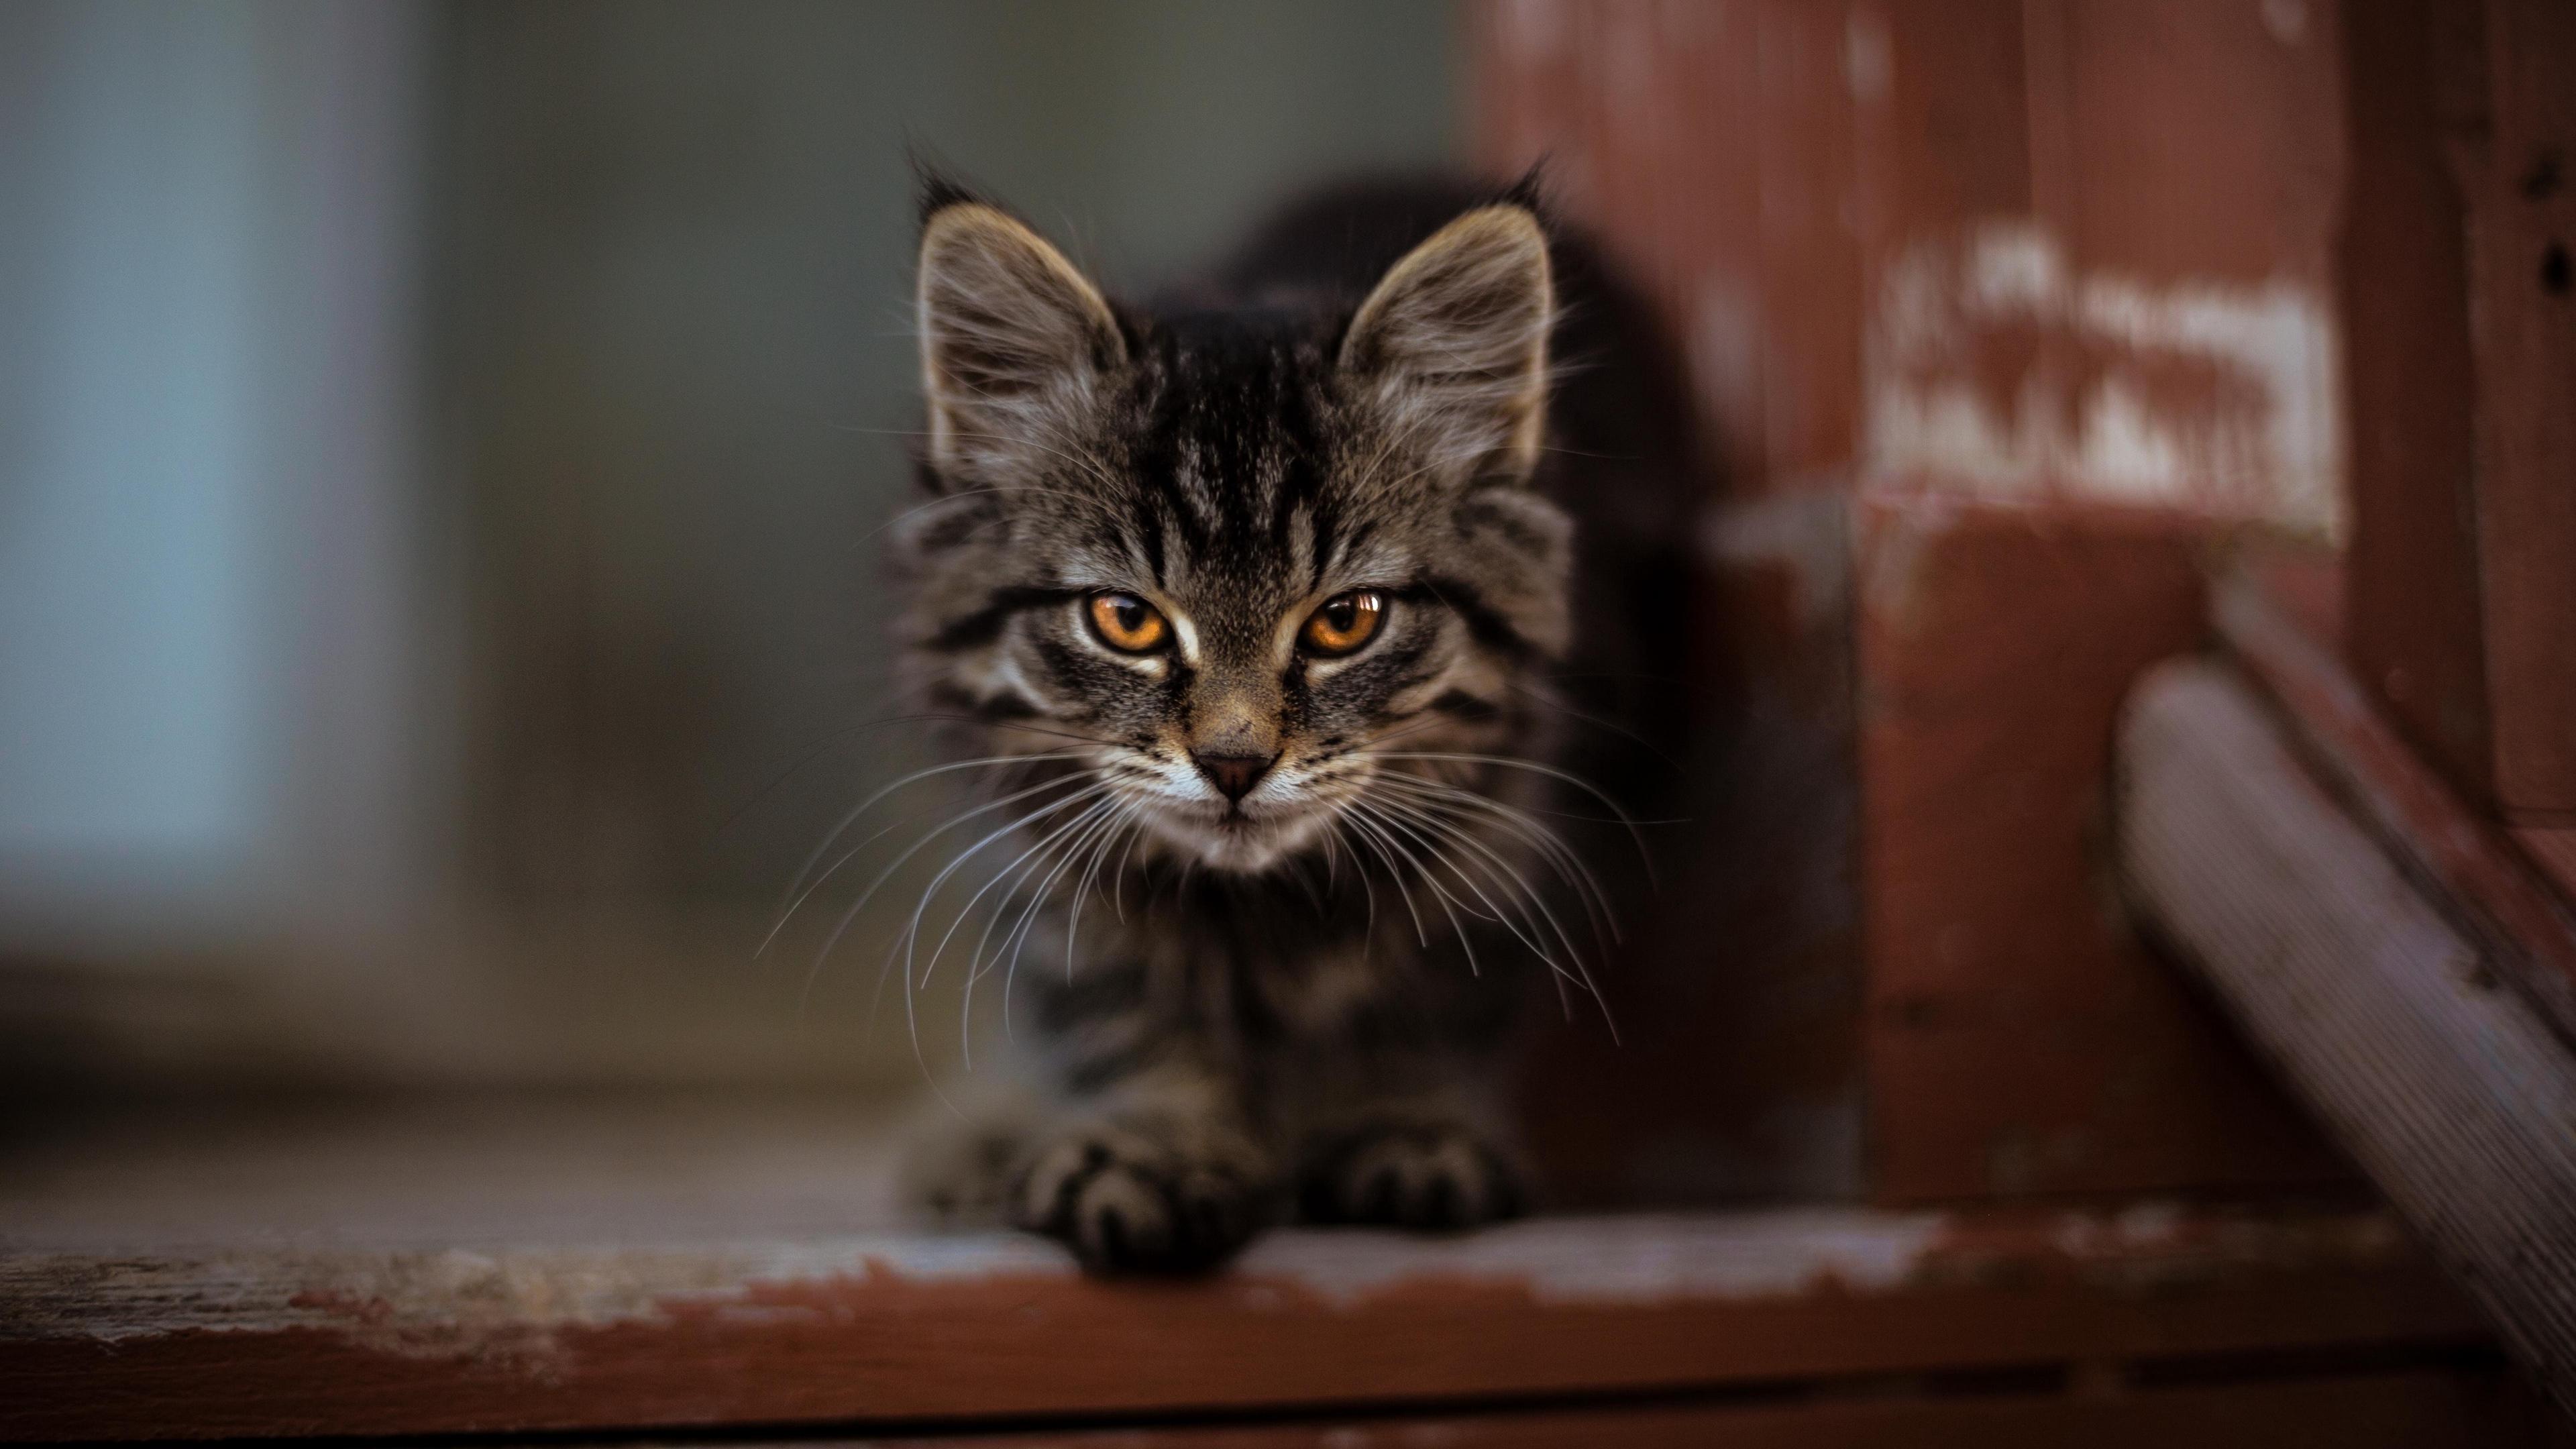 kitty cat fluffy cute 4k 1542242536 - kitty, cat, fluffy, cute 4k - Kitty, fluffy, Cat